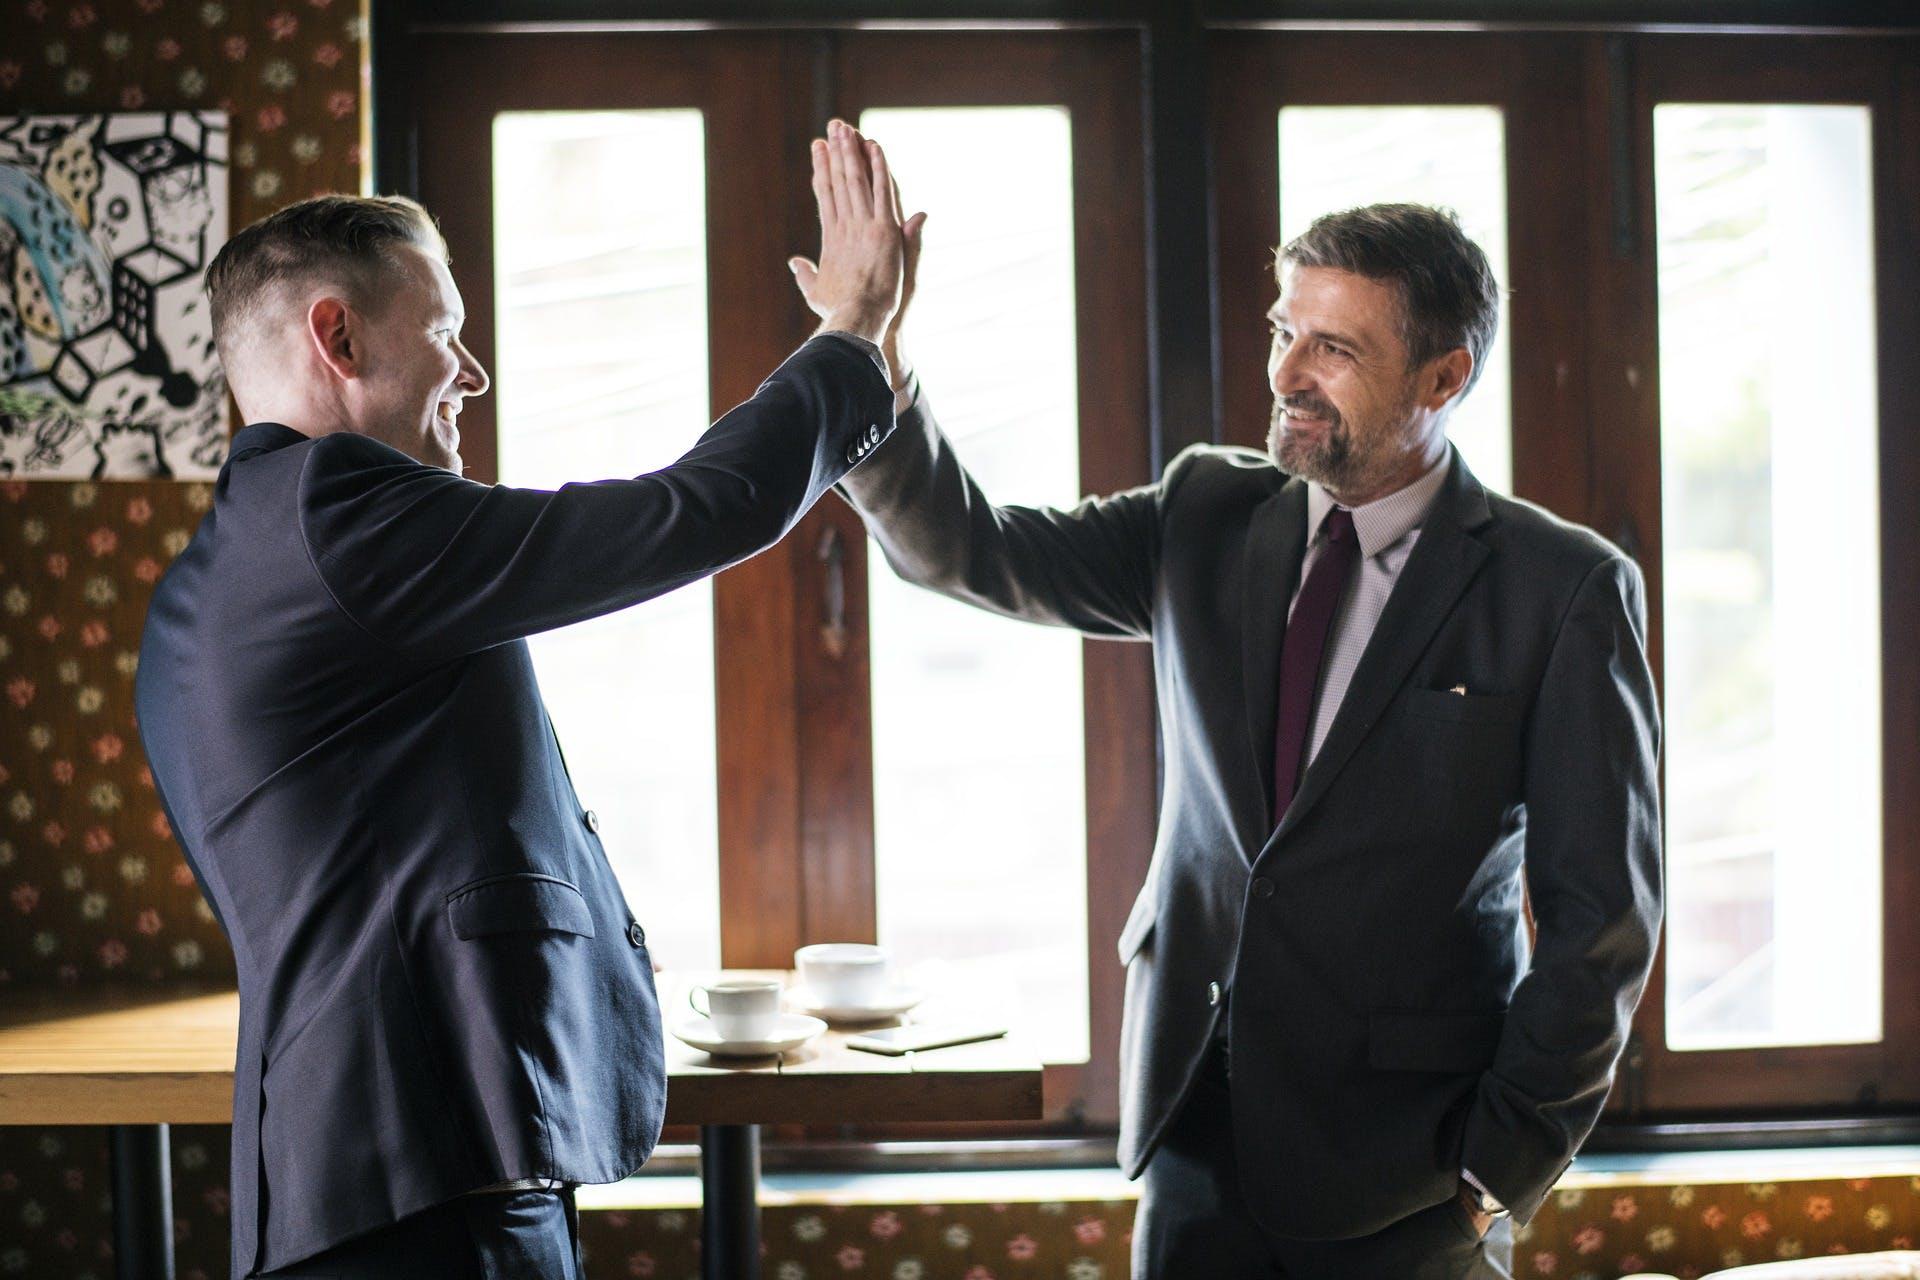 Männer-Business-High-Five-New-Leadership-Vereinbarung-Geschäft-3550391-pixabay-rawpixel